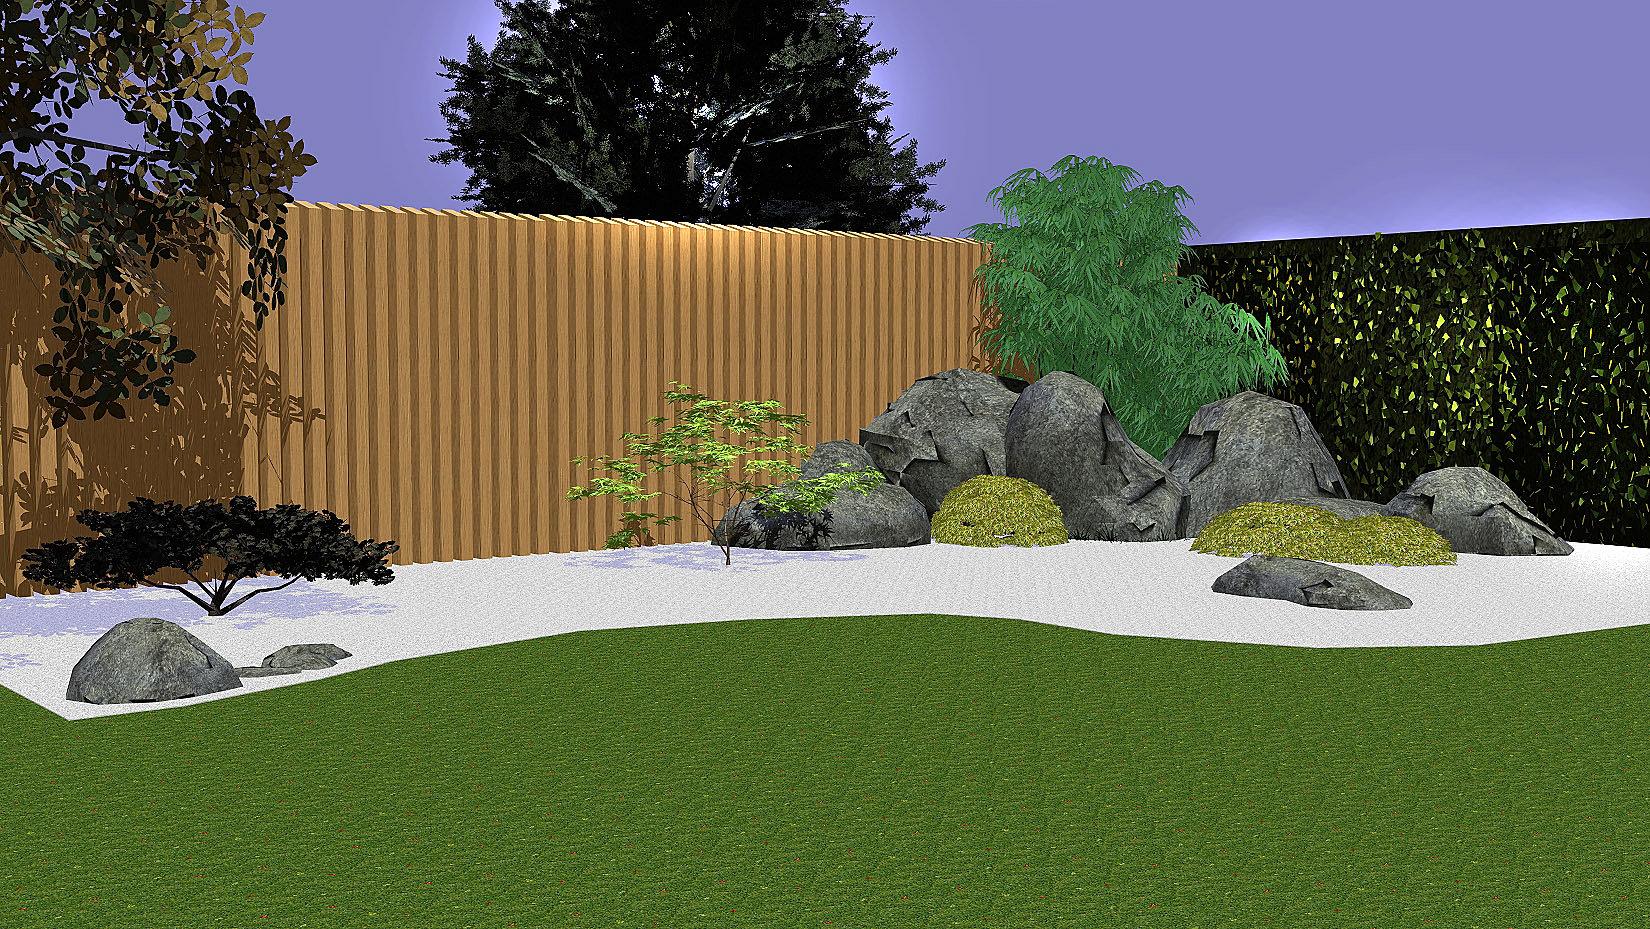 2a paysagiste castres jardin japonais. Black Bedroom Furniture Sets. Home Design Ideas